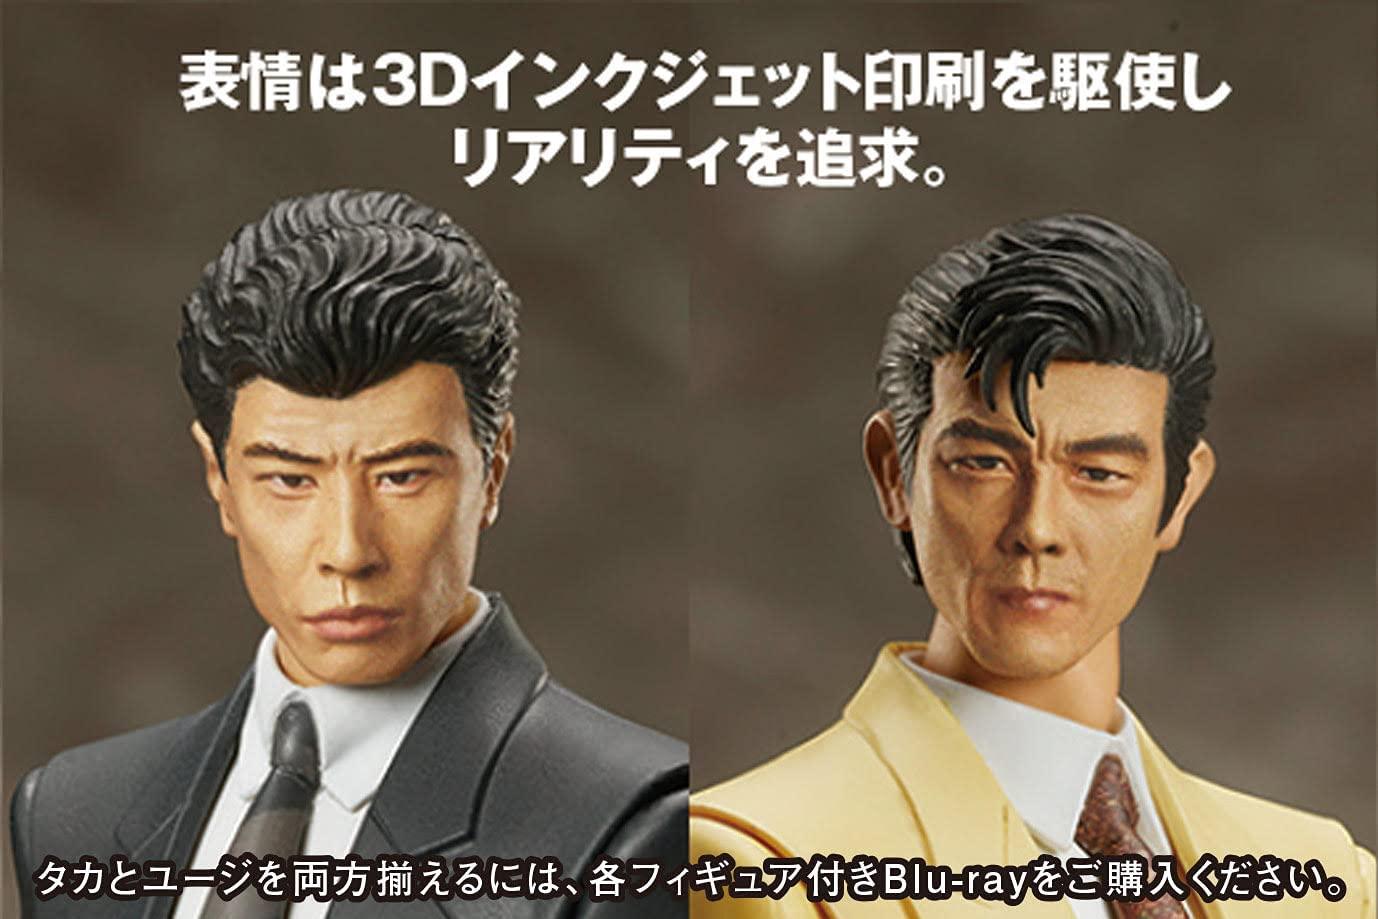 【DB】あぶない刑事 Blu-ray BOX VOL,1『タカフィギュア付き』完全予約限定生産-022